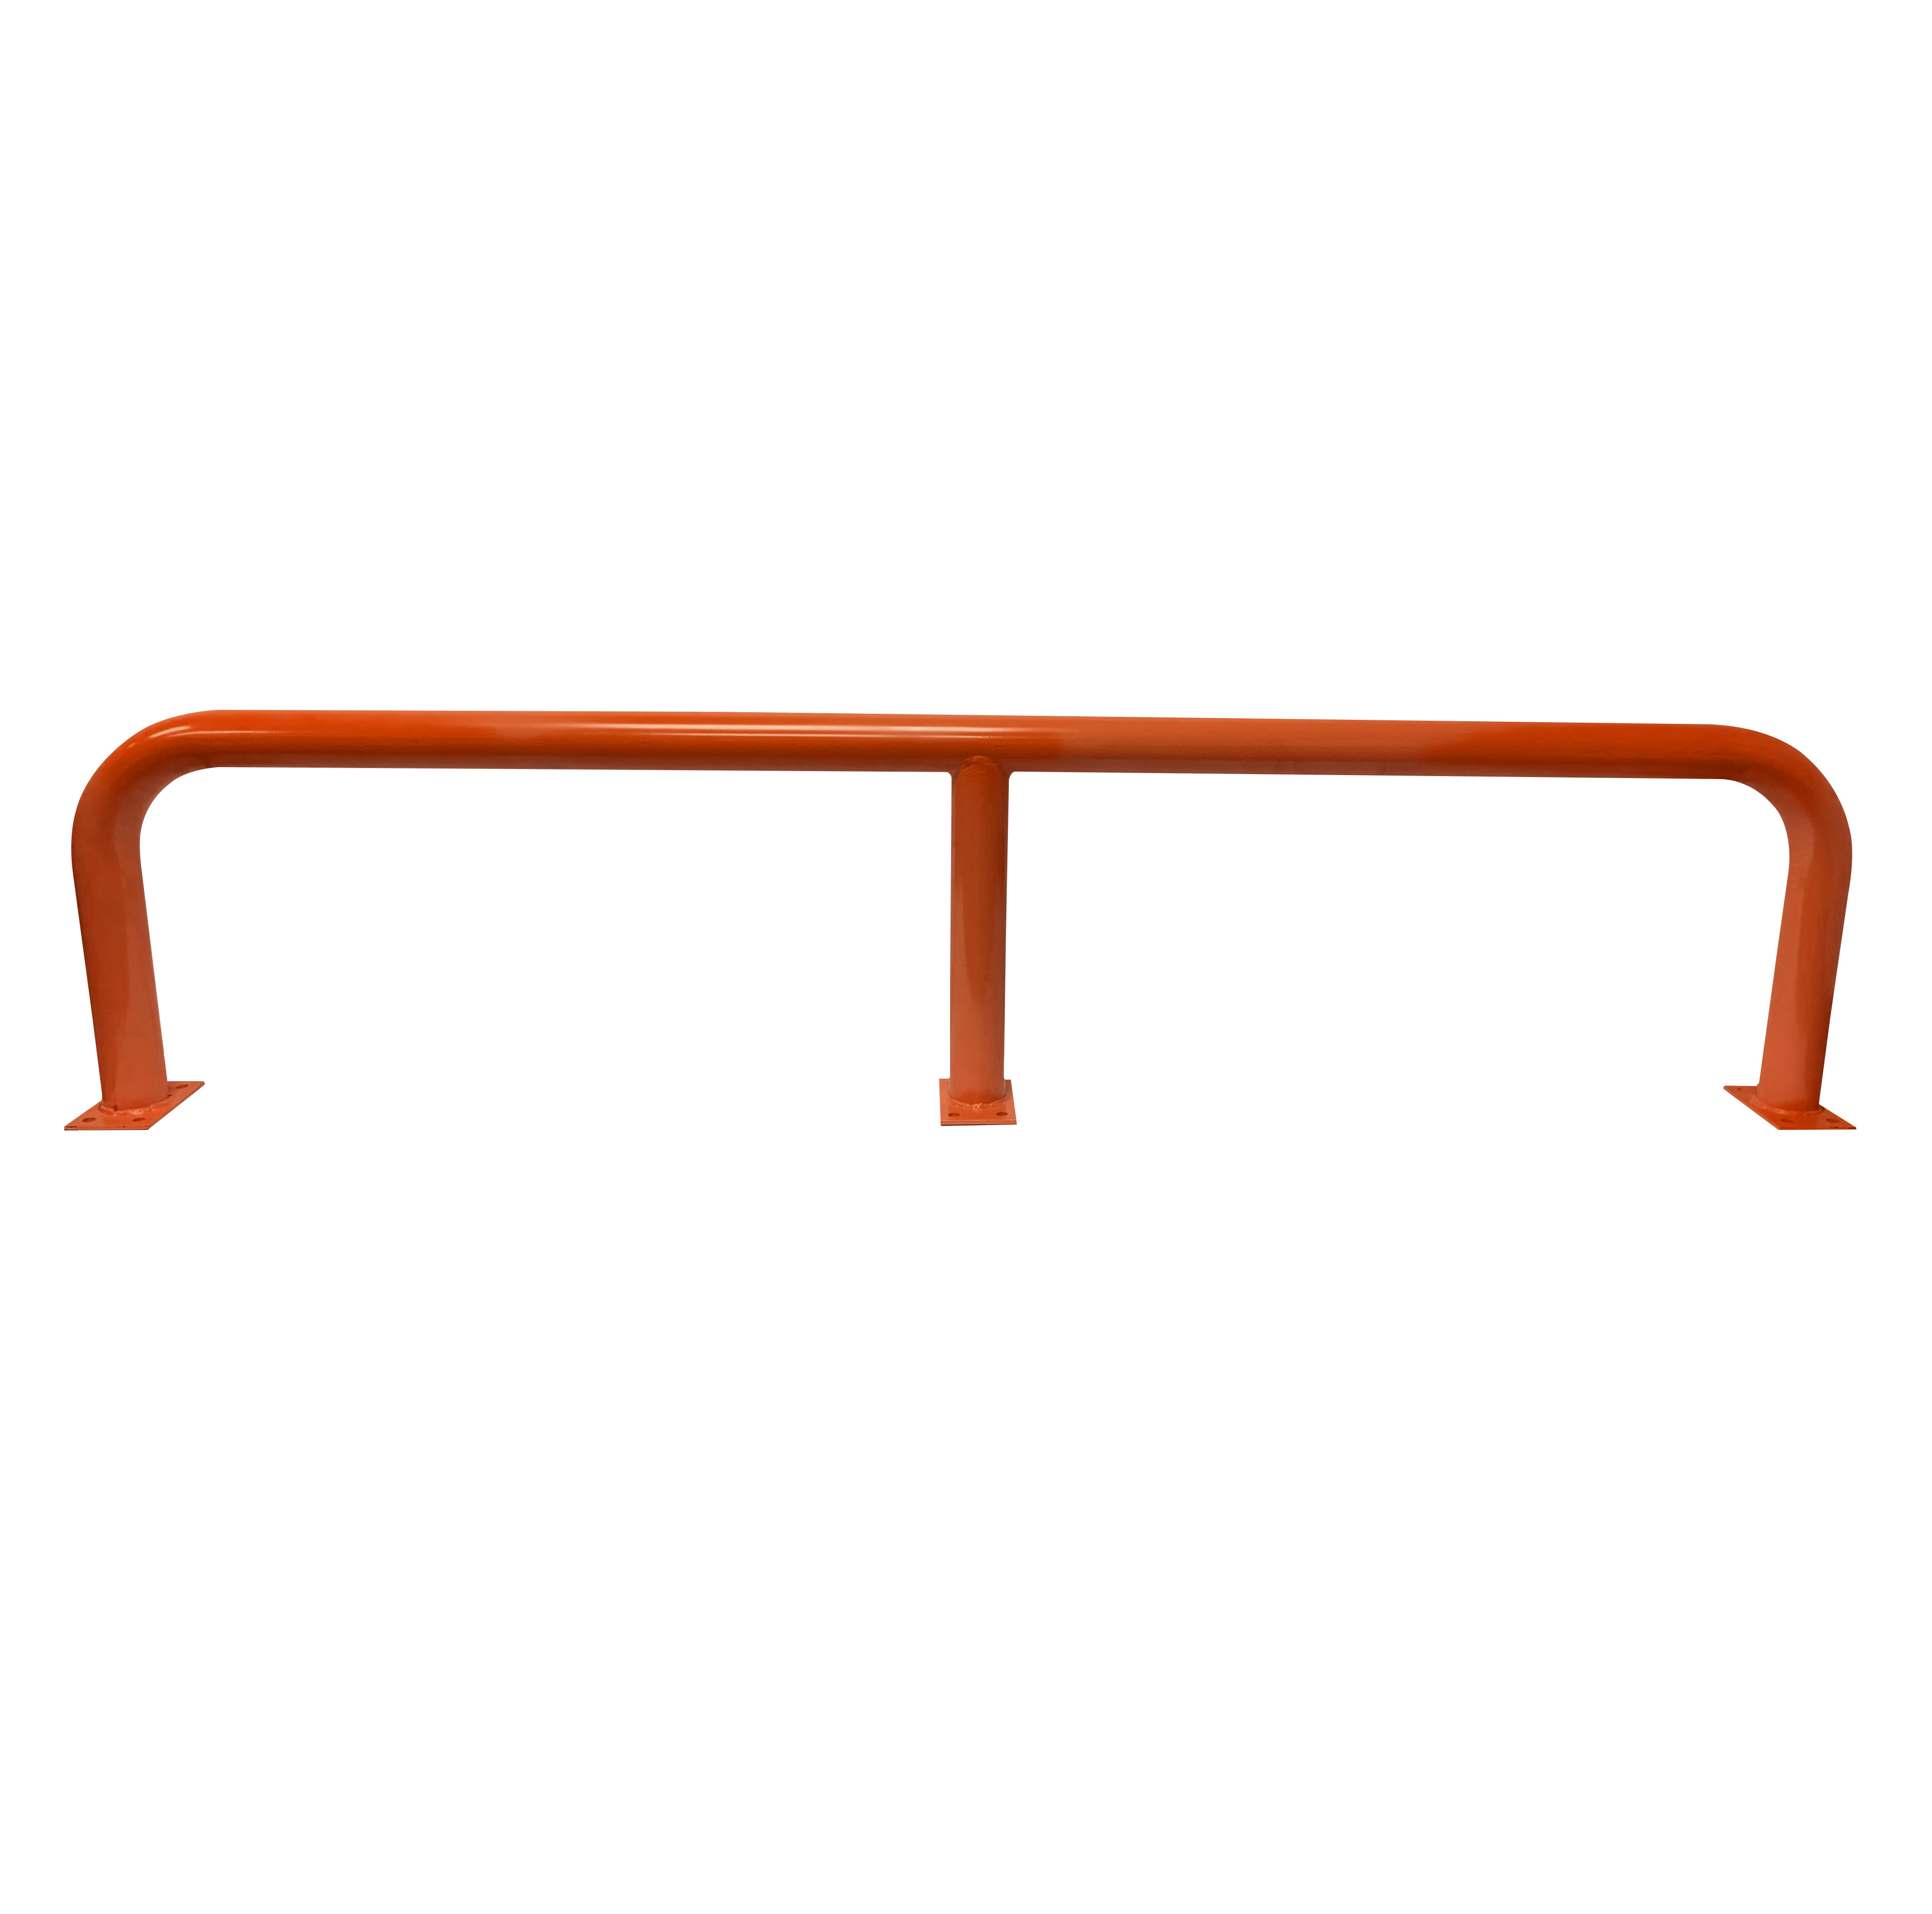 Barrier Protector - 500mm High x 2200mm Wide - 76mm Tube Orange